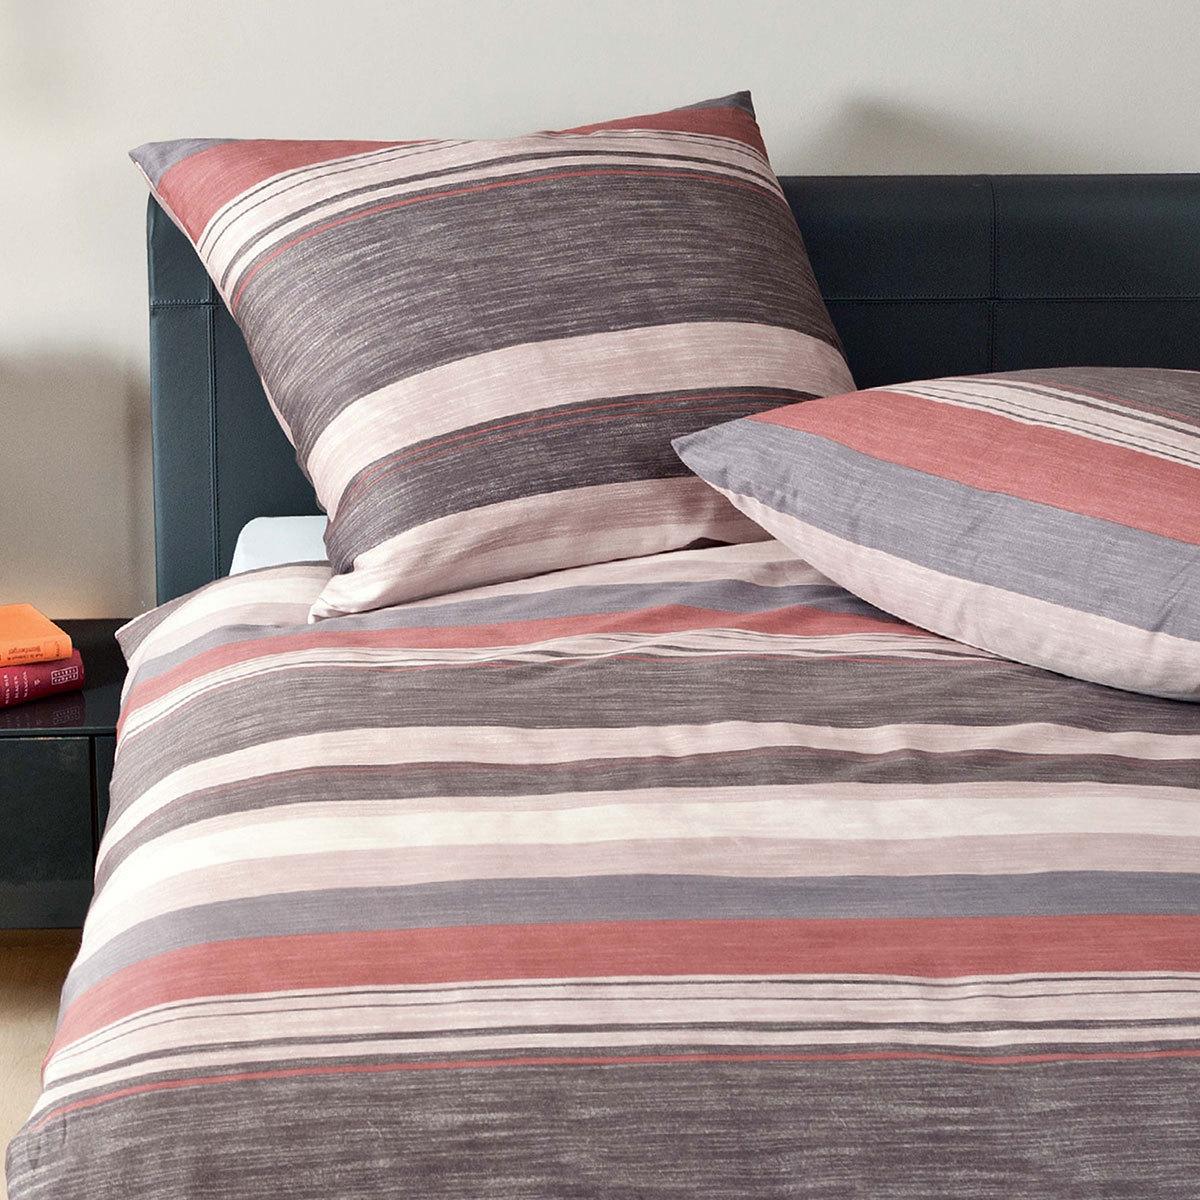 janine mako satin bettw sche moments 98019 07 g nstig online kaufen bei bettwaren shop. Black Bedroom Furniture Sets. Home Design Ideas